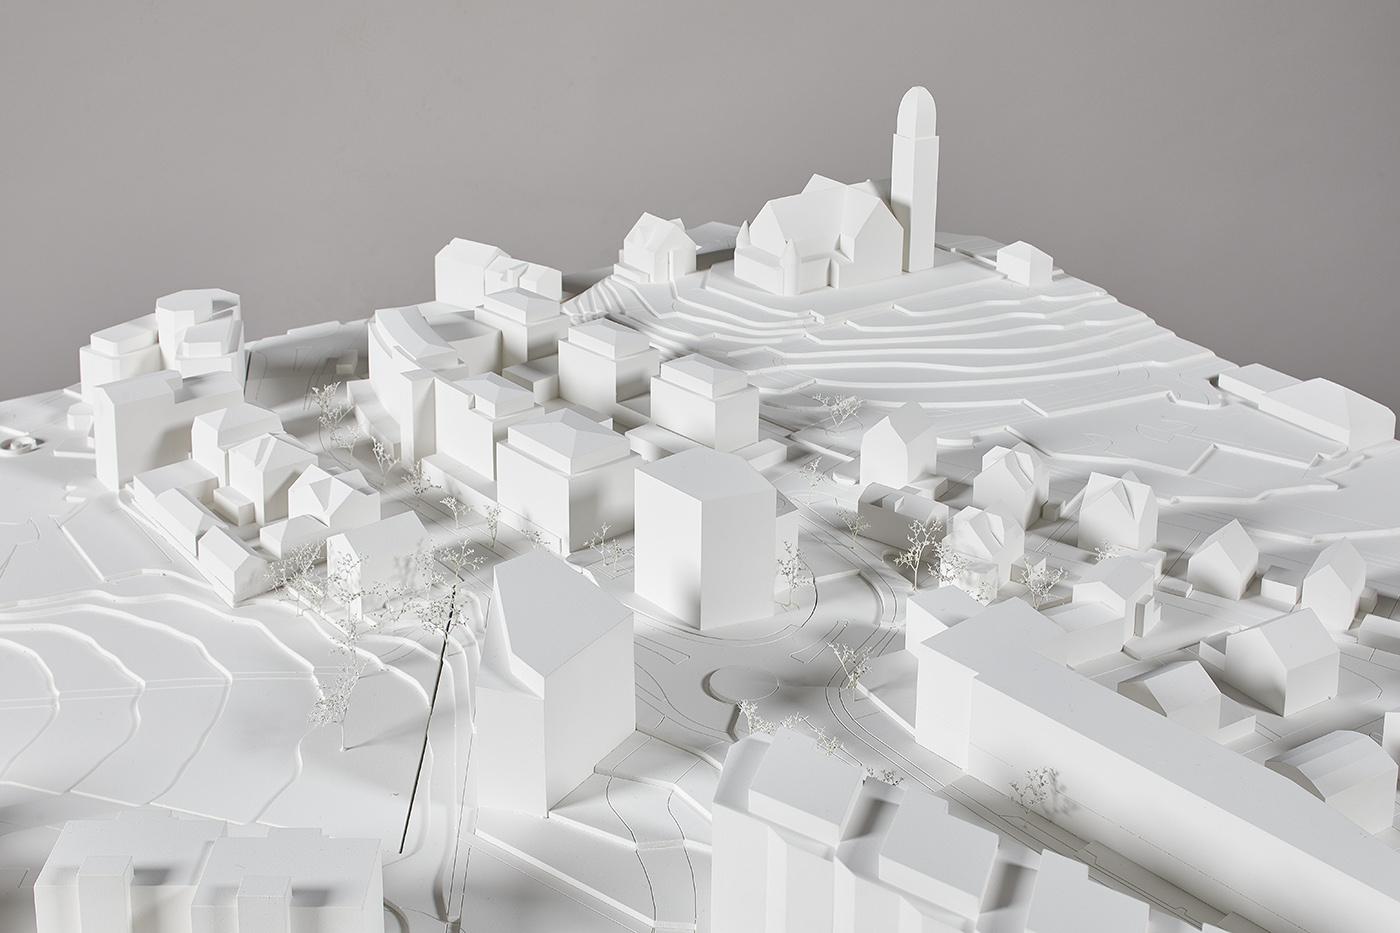 buan architekten – Studienauftrag Kanzlei-Kreisel Emmenbrücke – Situationsmodell 2